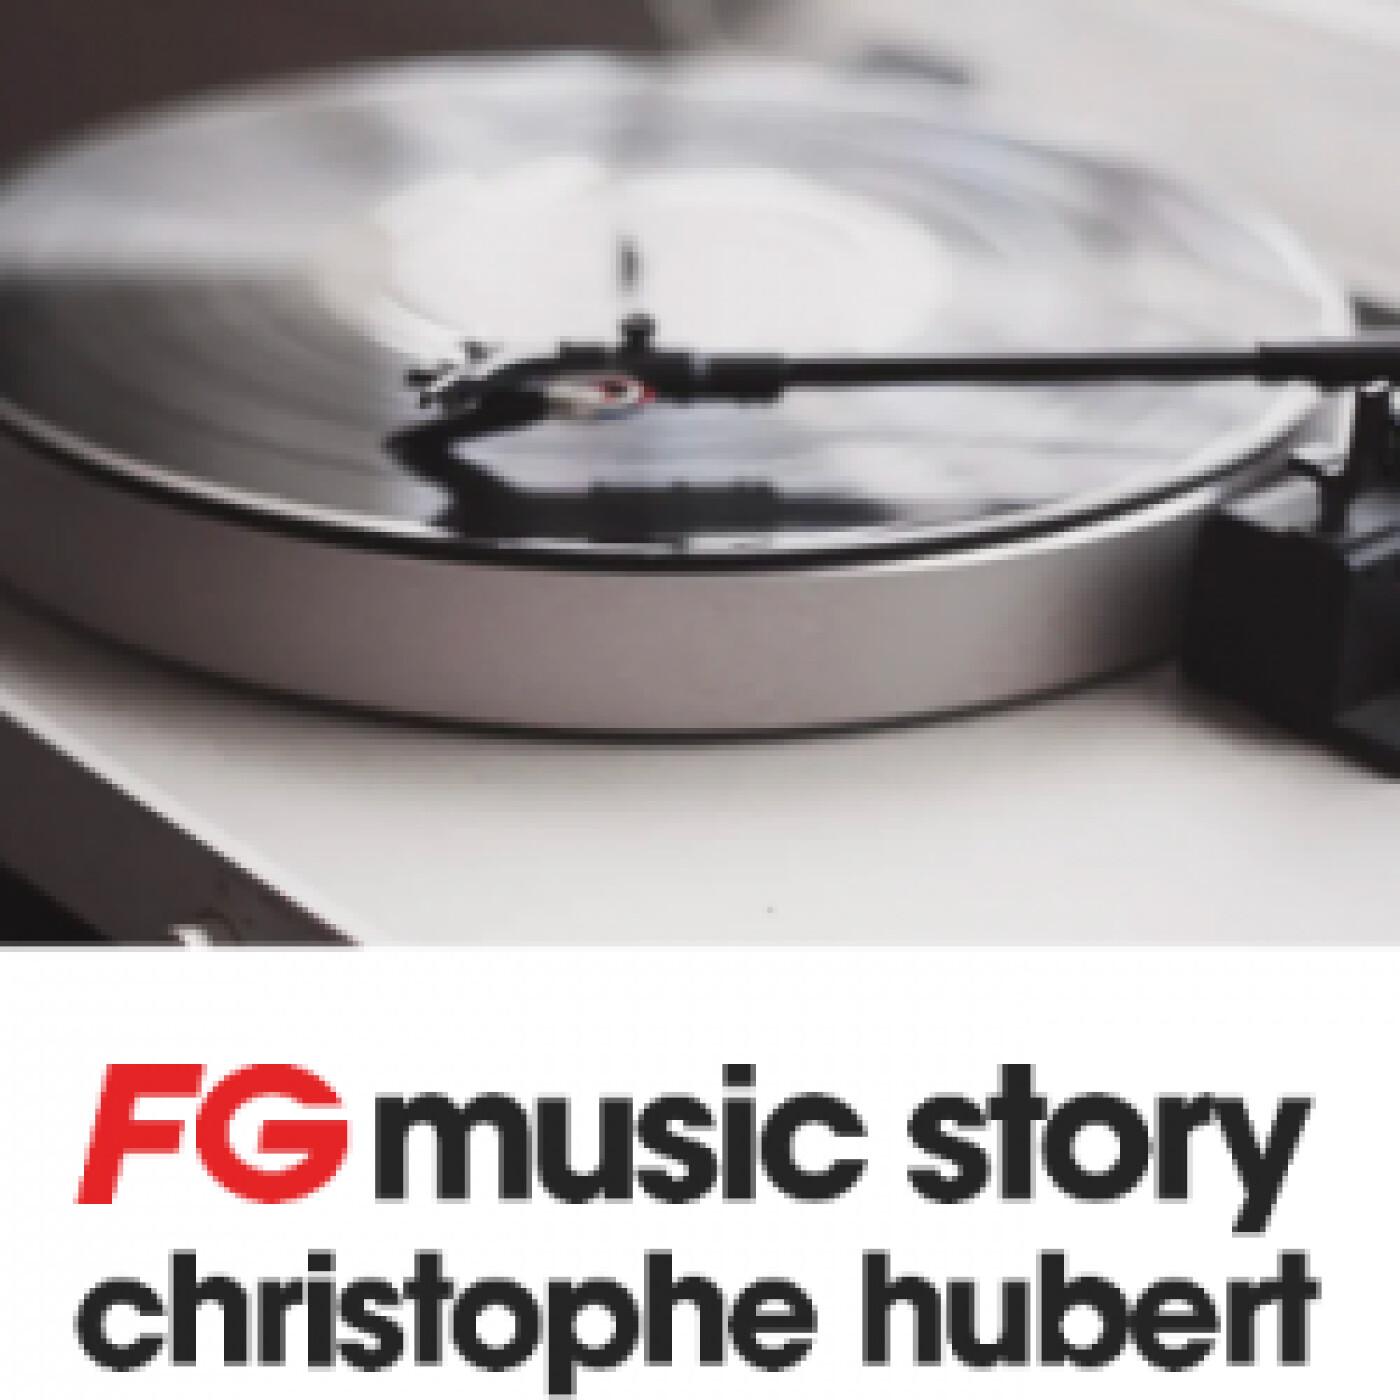 FG MUSIC STORY : LOUIE VEGA